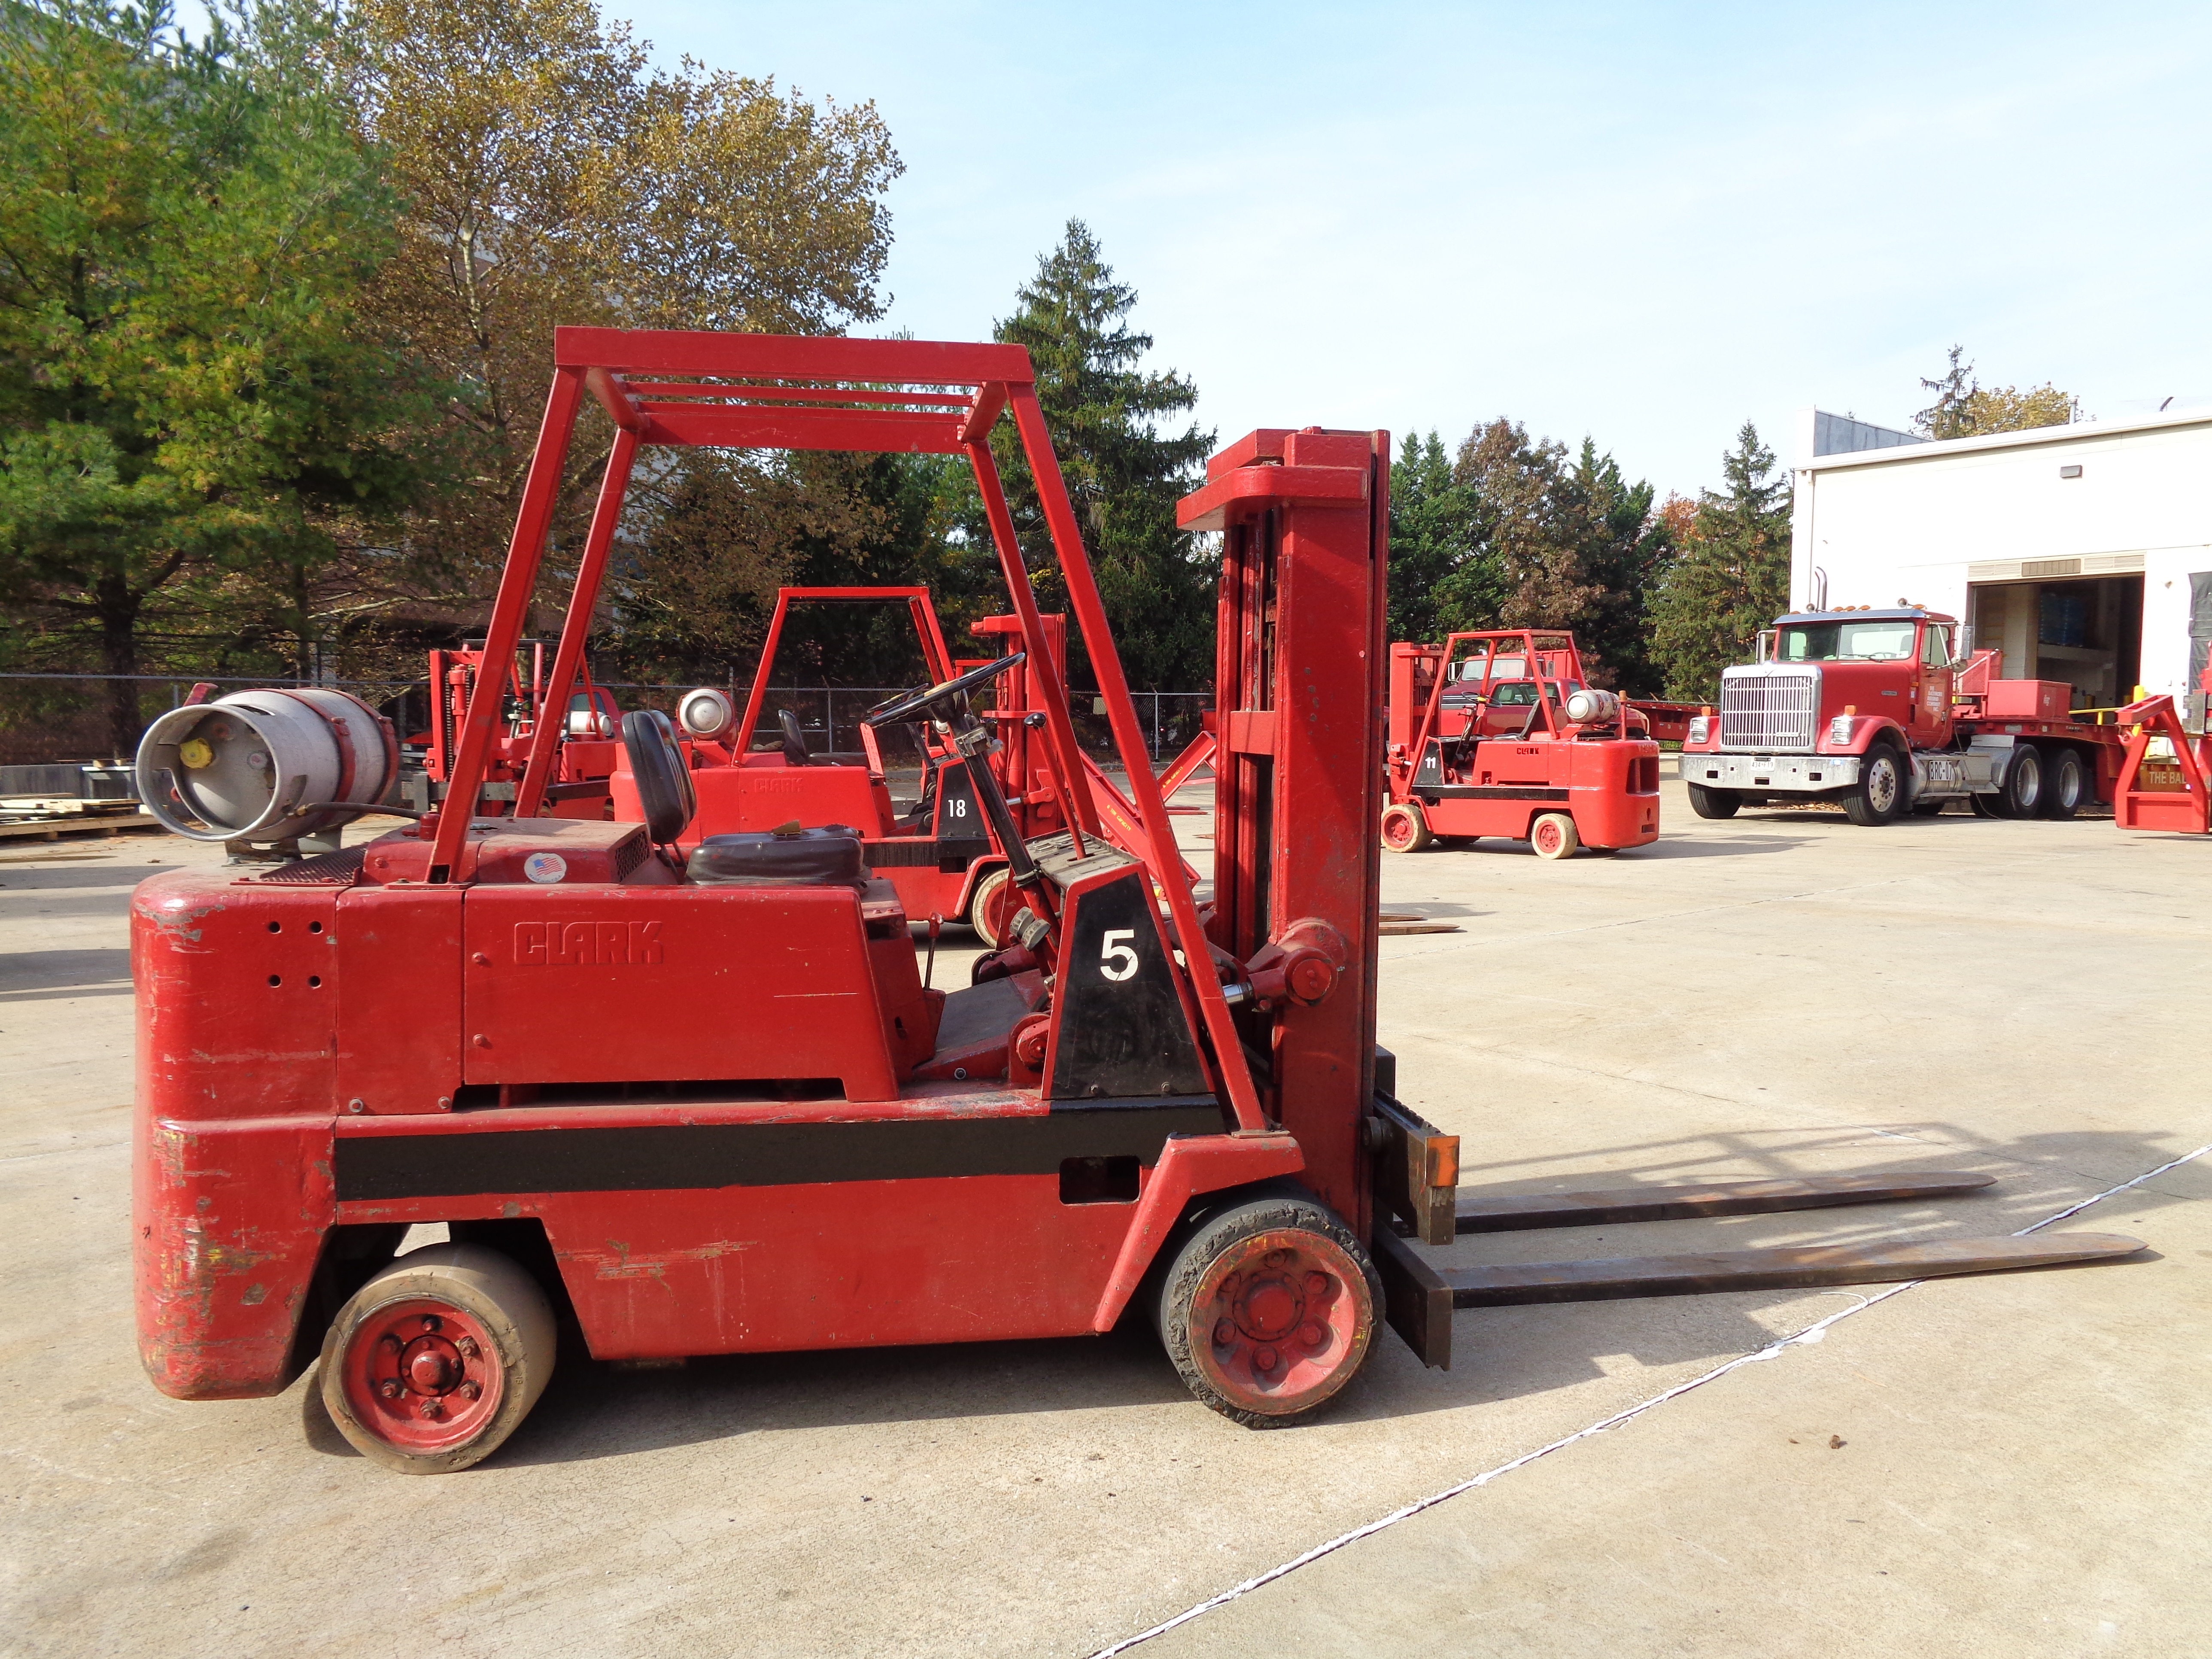 Clark C120-35 Forklift - 12,000 lbs - Image 5 of 6